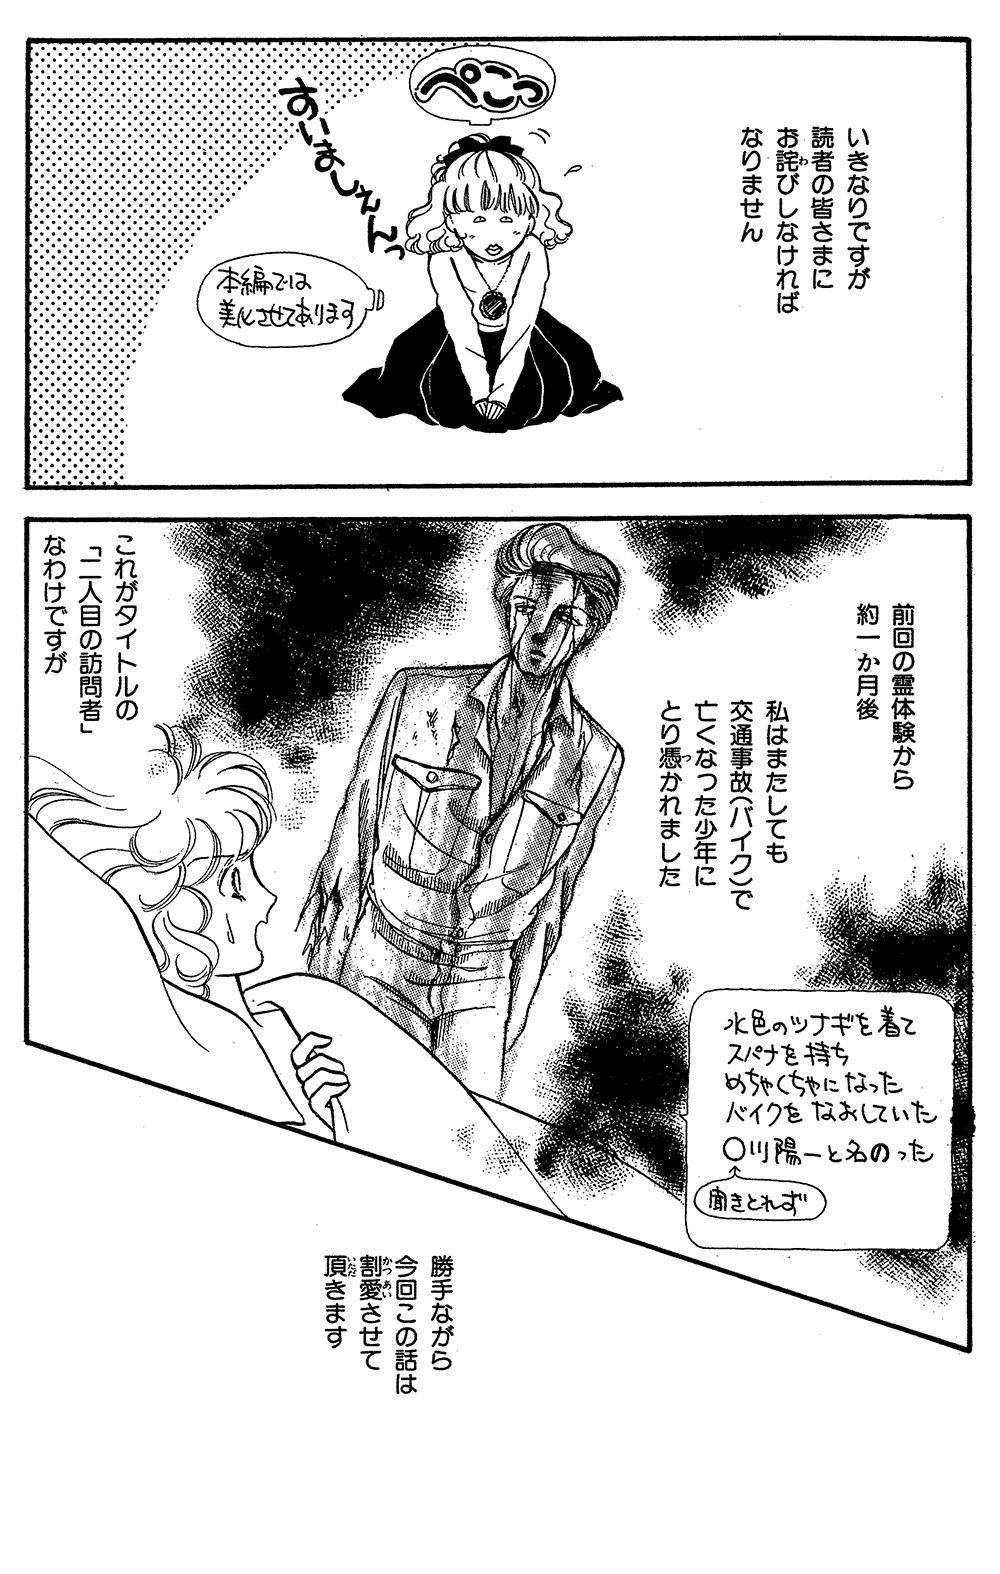 mayuri2-1-2.jpg